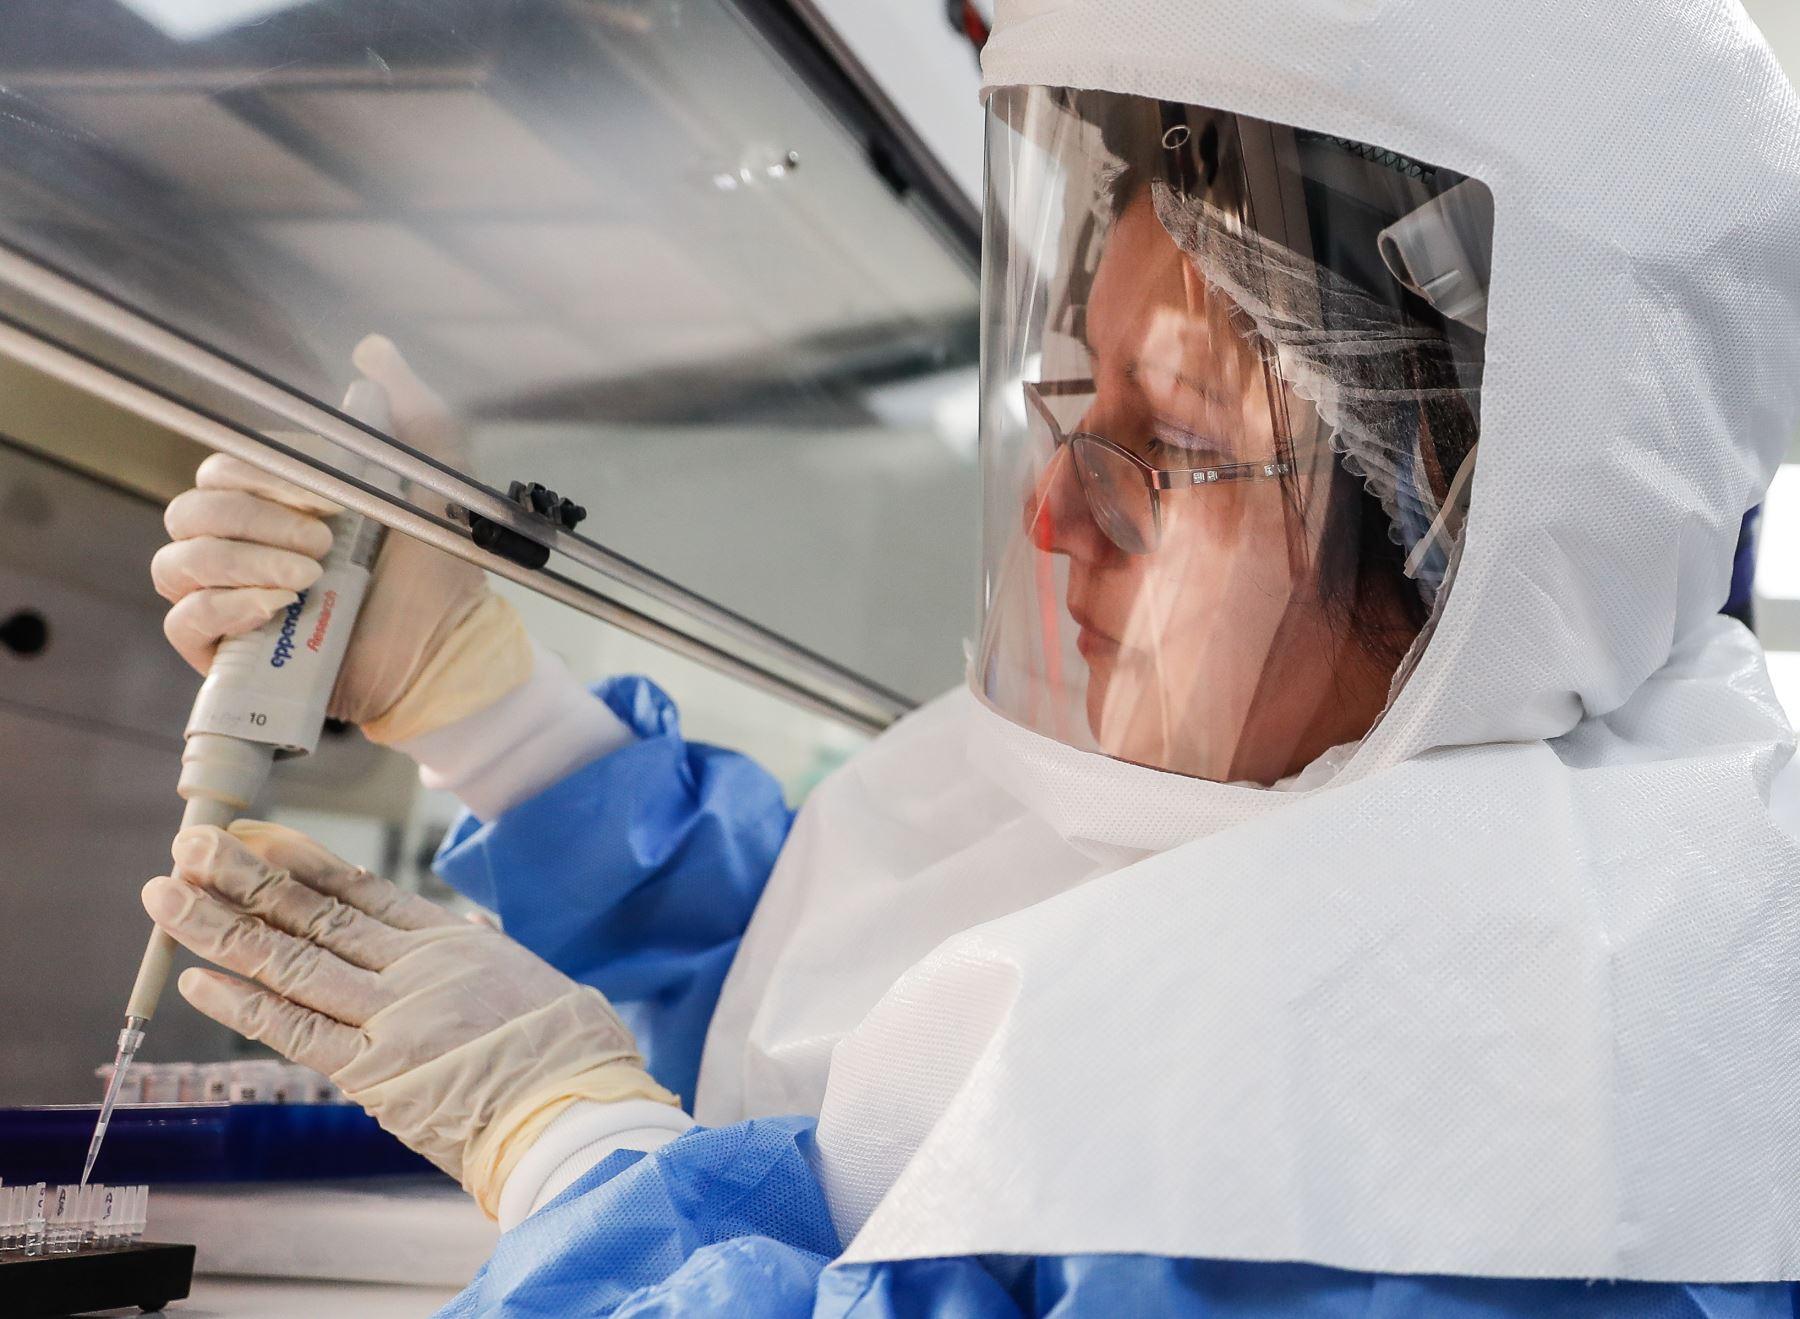 National Health Institute: No coronavirus cases confirmed in Peru ...